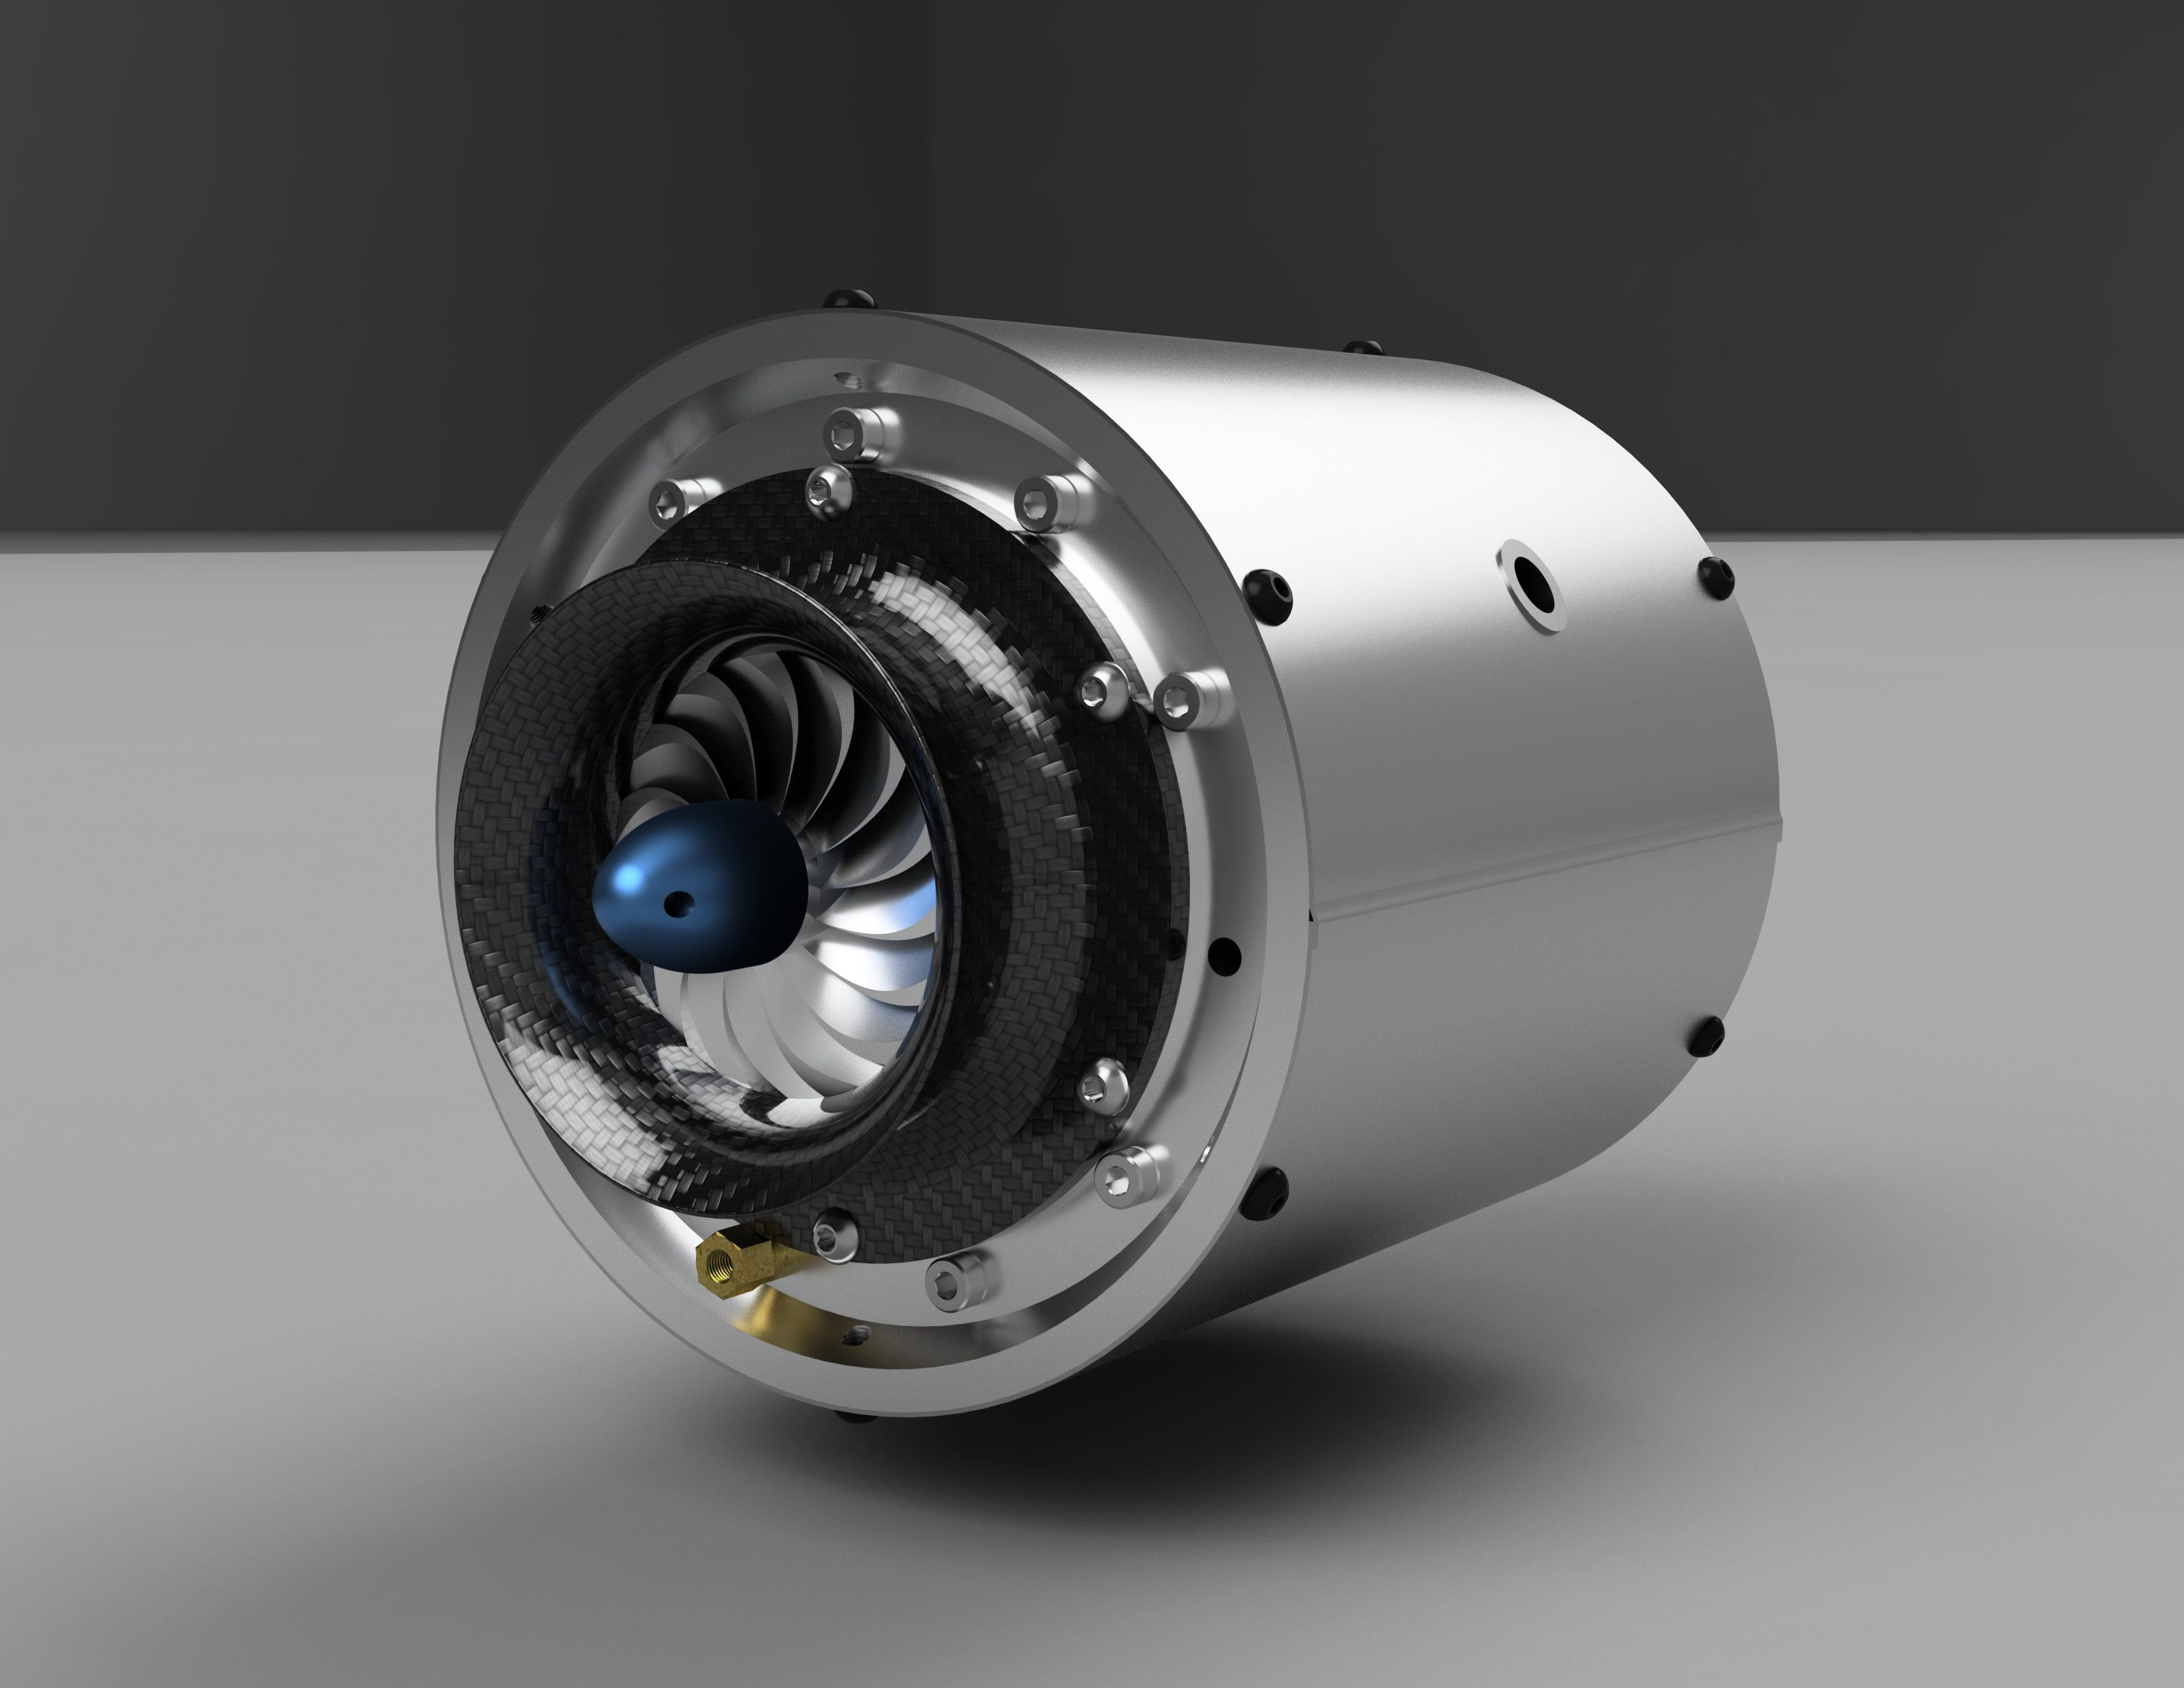 3D Wren Gas Turbine Engine 3D Model 3D Modeling